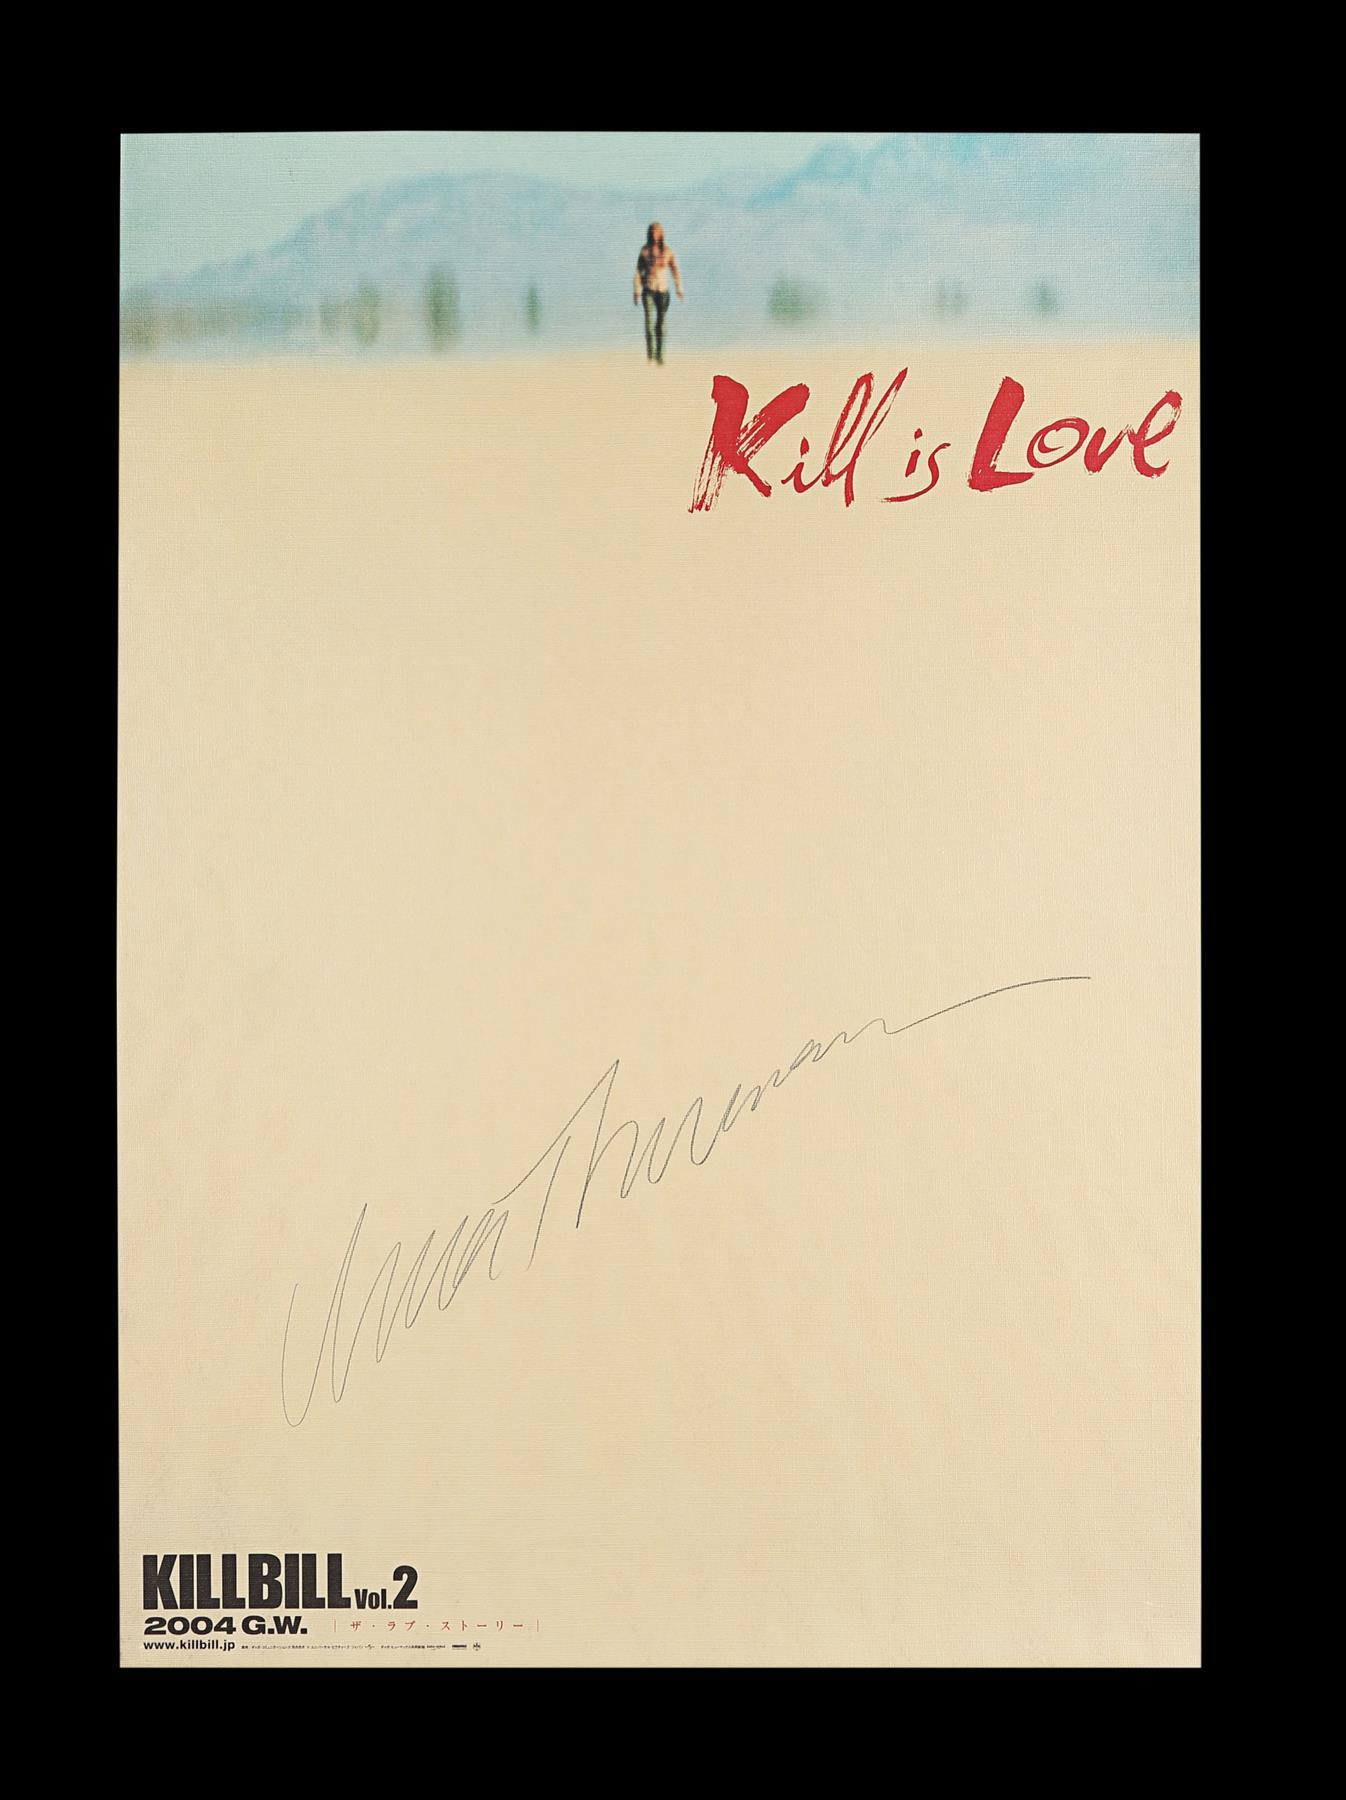 KILL BILL: VOLUME II (2004) - Japanese B1, 2004, Autographed by Uma Thurman